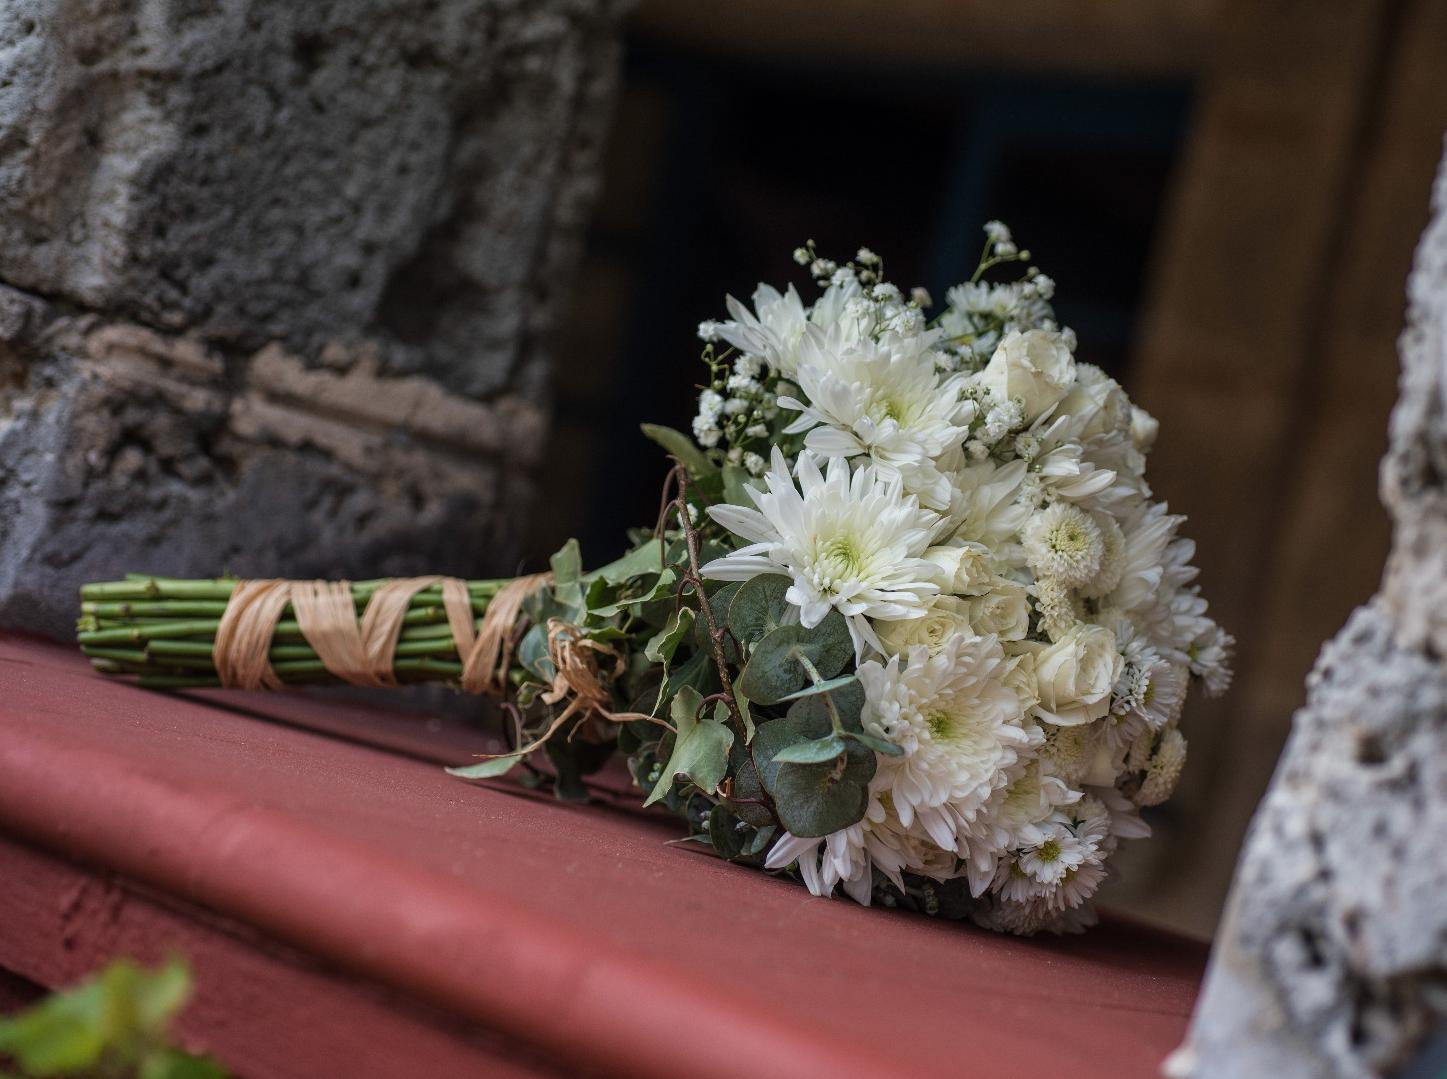 bodas-sin-clasificar-sin-tema-cuba-34421.jpg